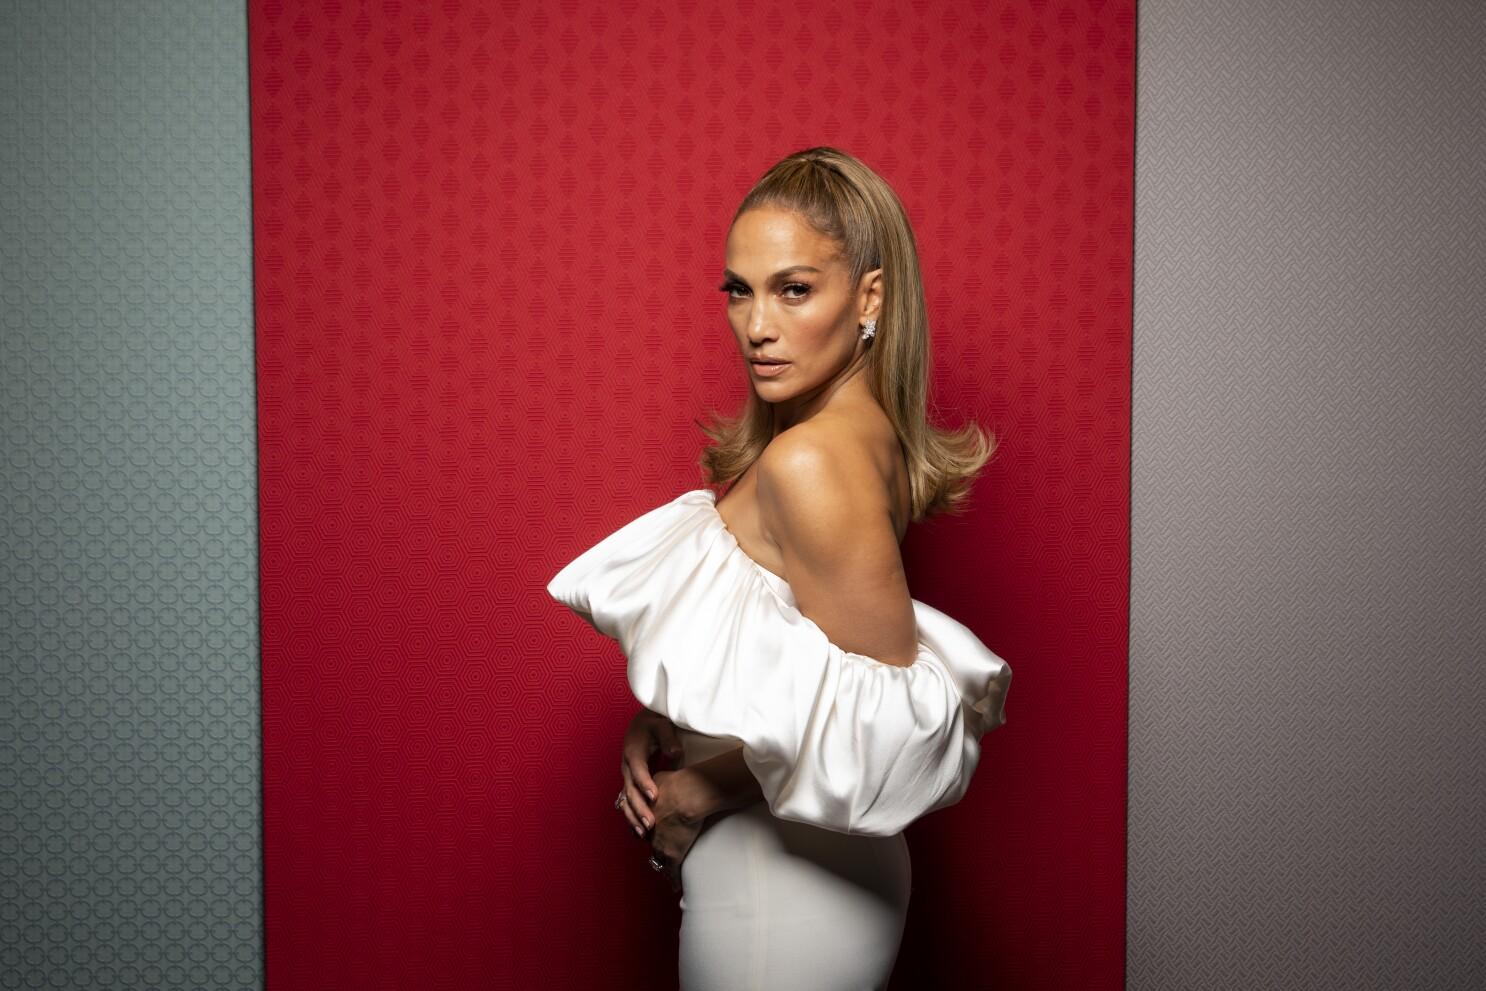 Super Bowl 2020 Halftime Show Time.Jennifer Lopez Might Headline The Super Bowl 2020 Halftime